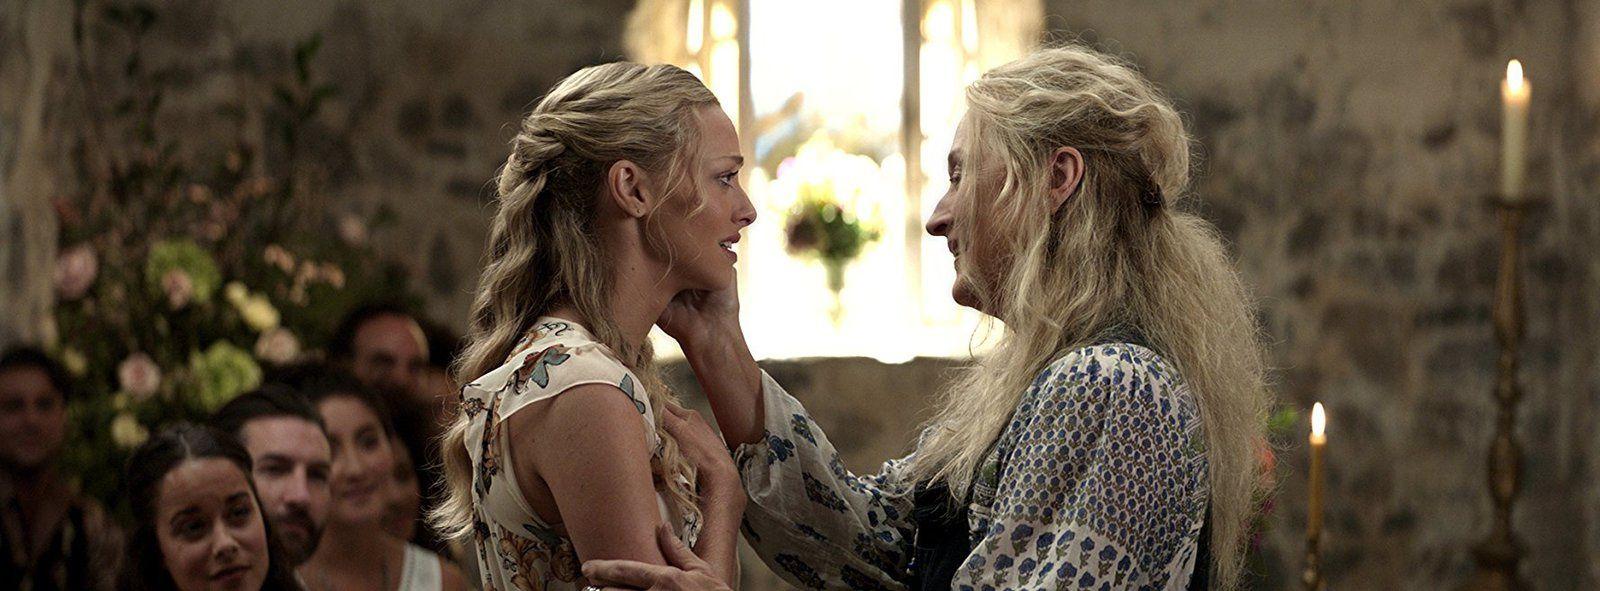 Mamma Mia : Here We Go Again ! (BANDE-ANNONCE 1 et 2) avec Amanda Seyfried, Meryl Streep, Cher - Le 25 juillet 2018 au cinéma